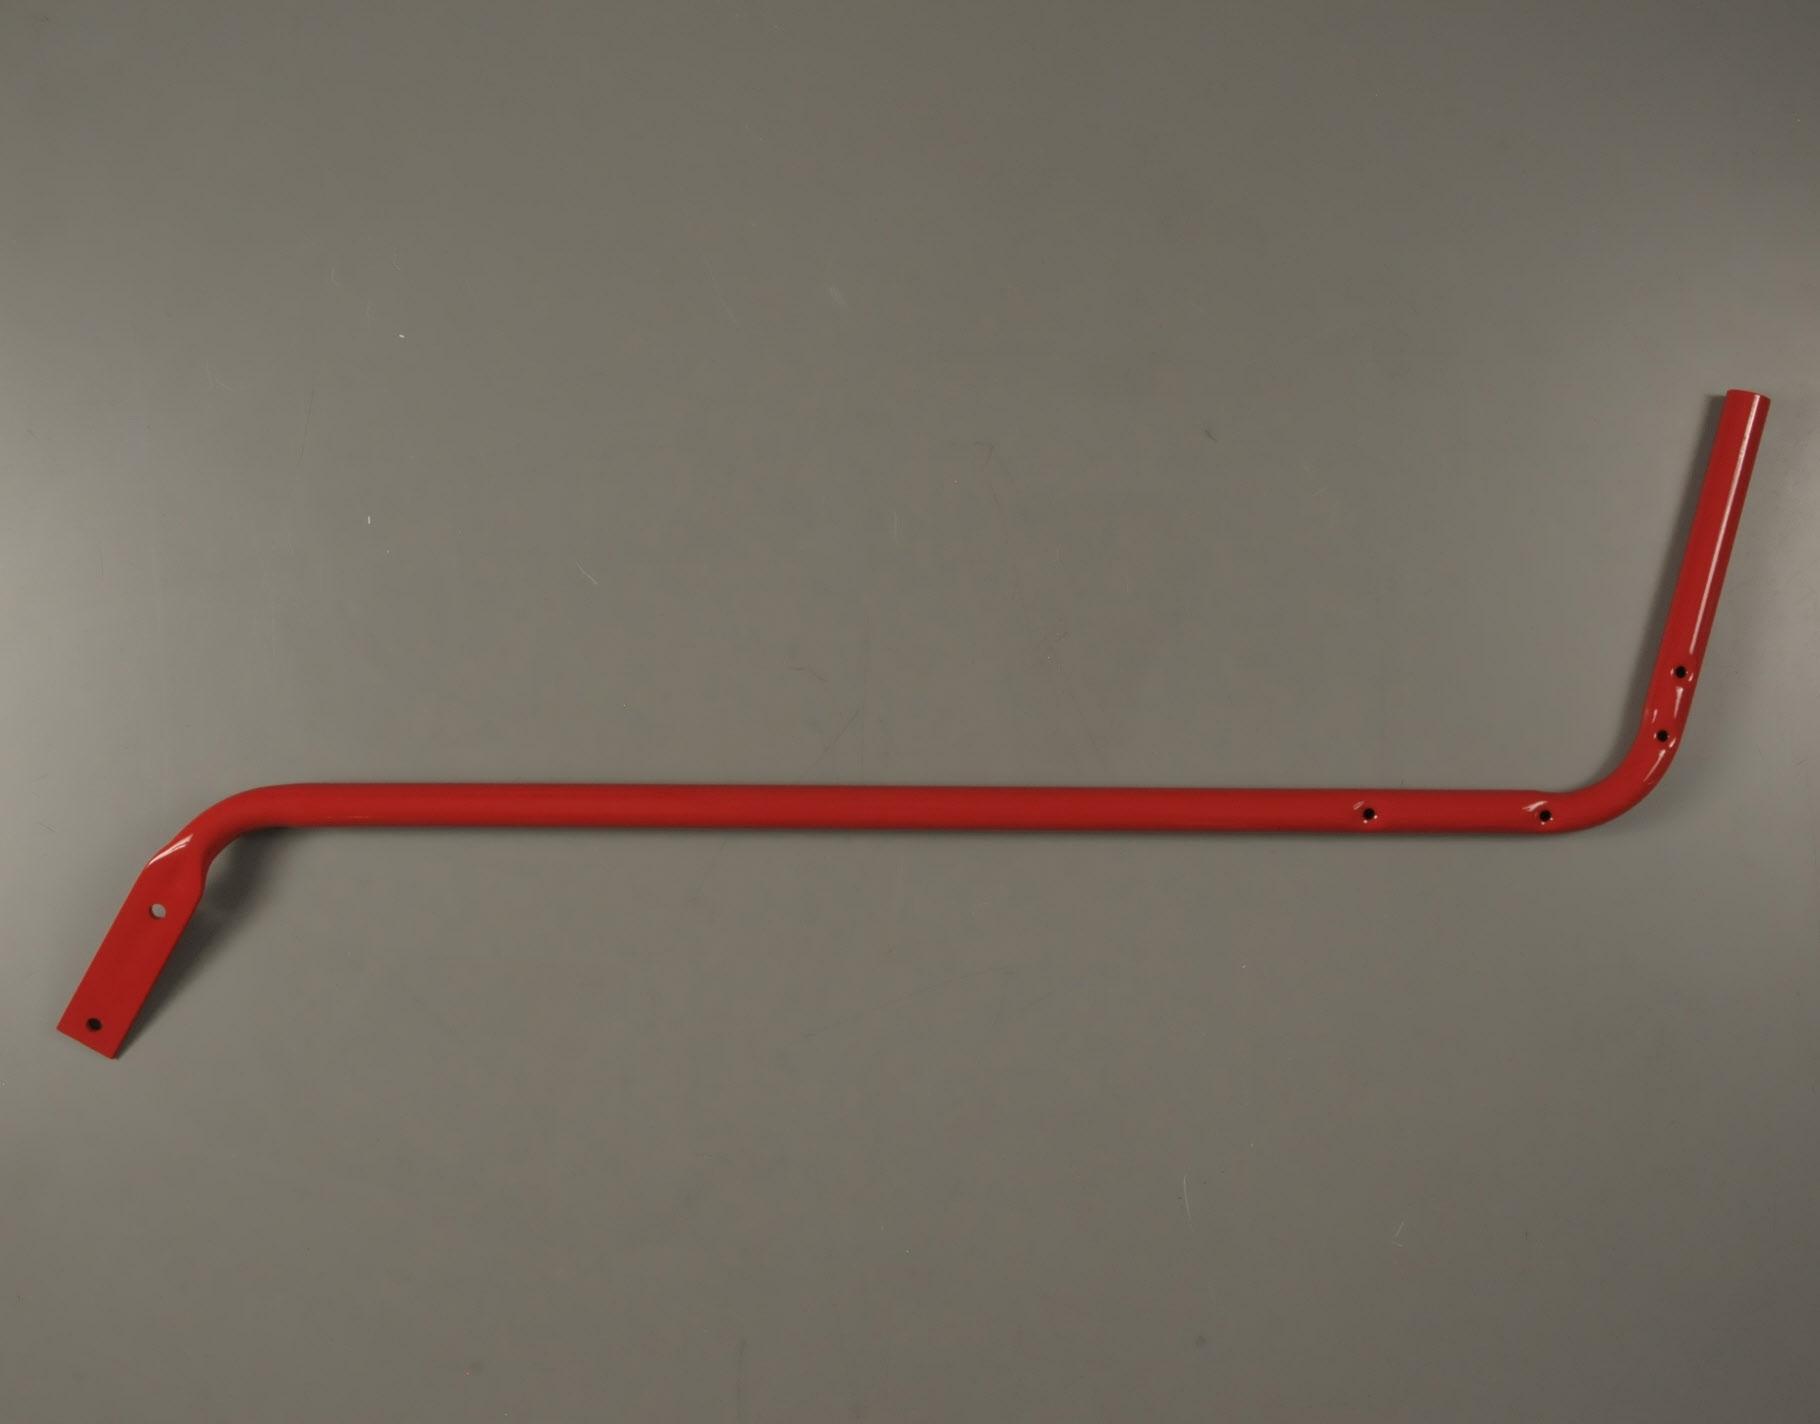 Lawn Mower Part #  - Handle - Genuine OEM Part - Troy-Bilt 1764922010